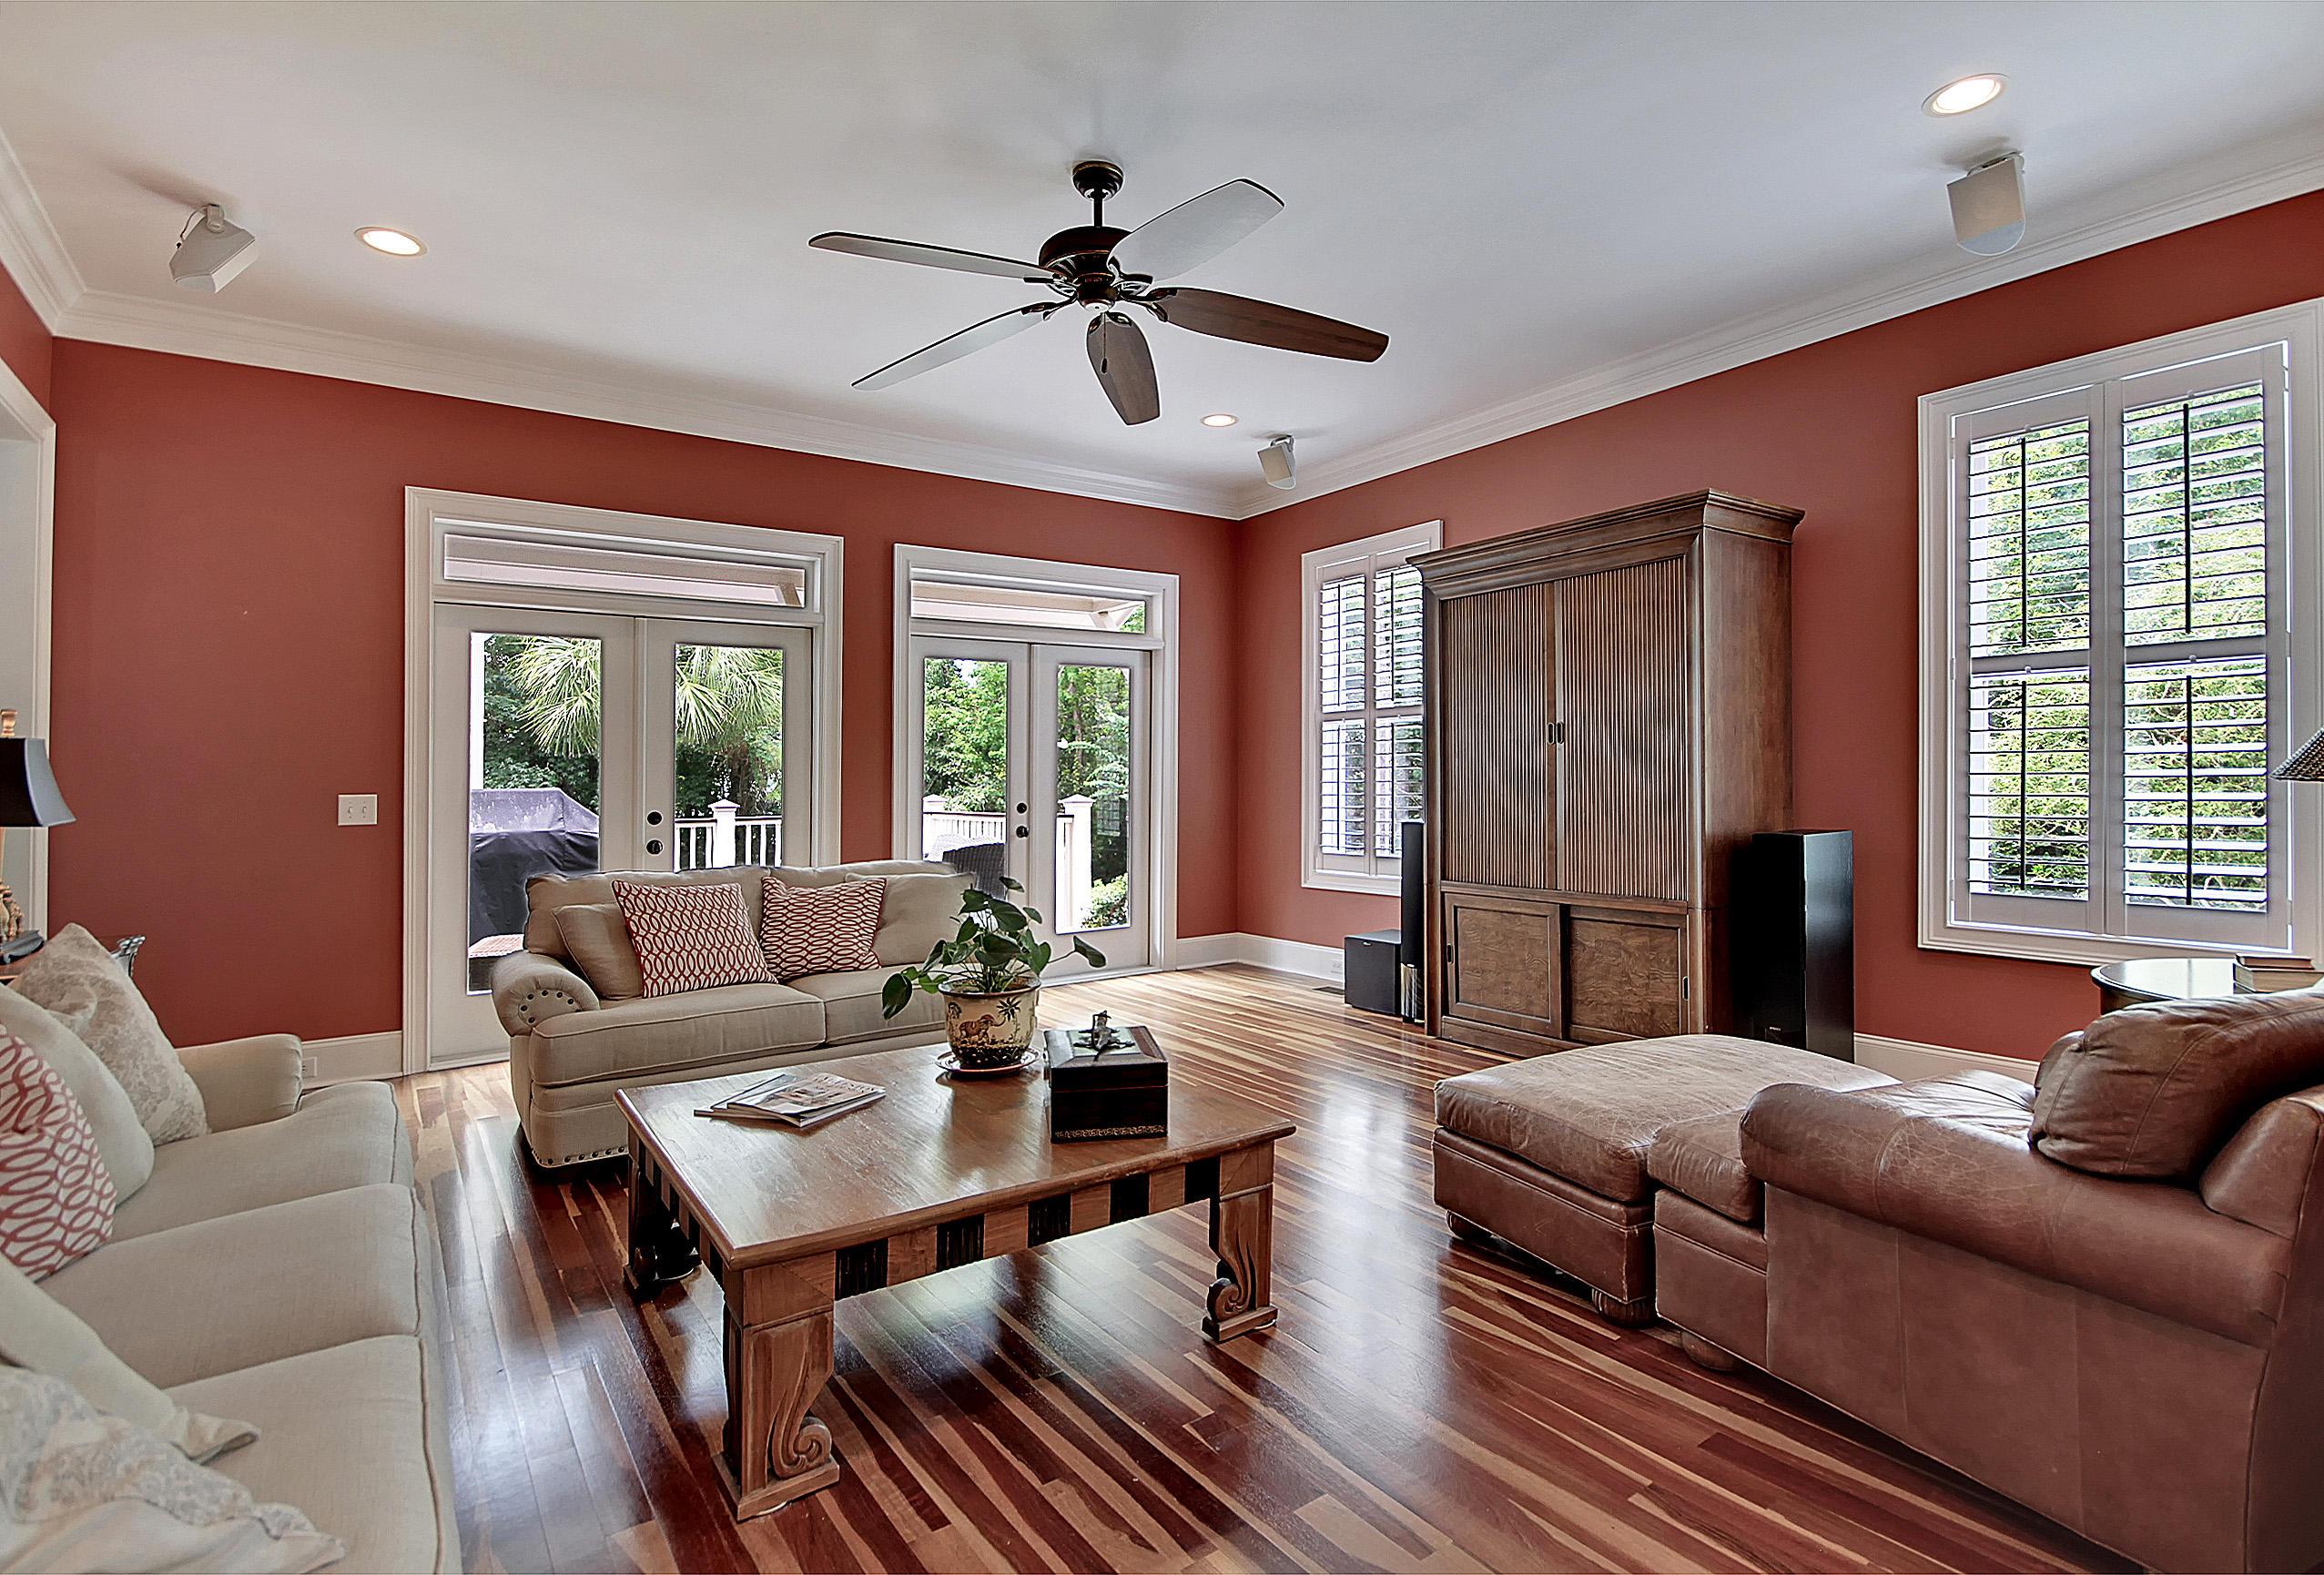 Belle Hall Homes For Sale - 368 Evian, Mount Pleasant, SC - 29